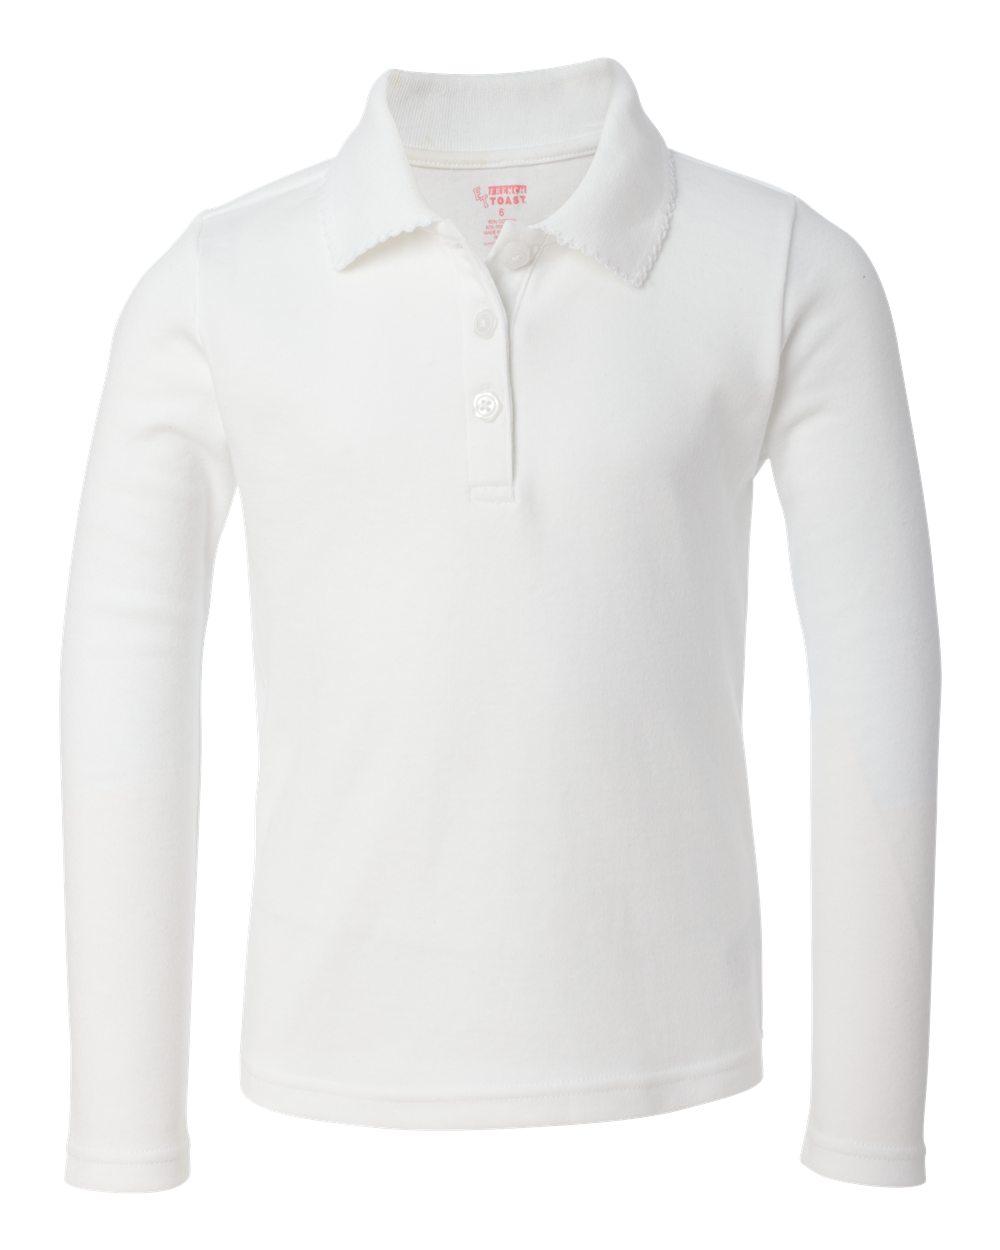 9ed71812 Girl's Long Sleeve Polo Shirt with Picot Collar – Item #A9424 – Big ...